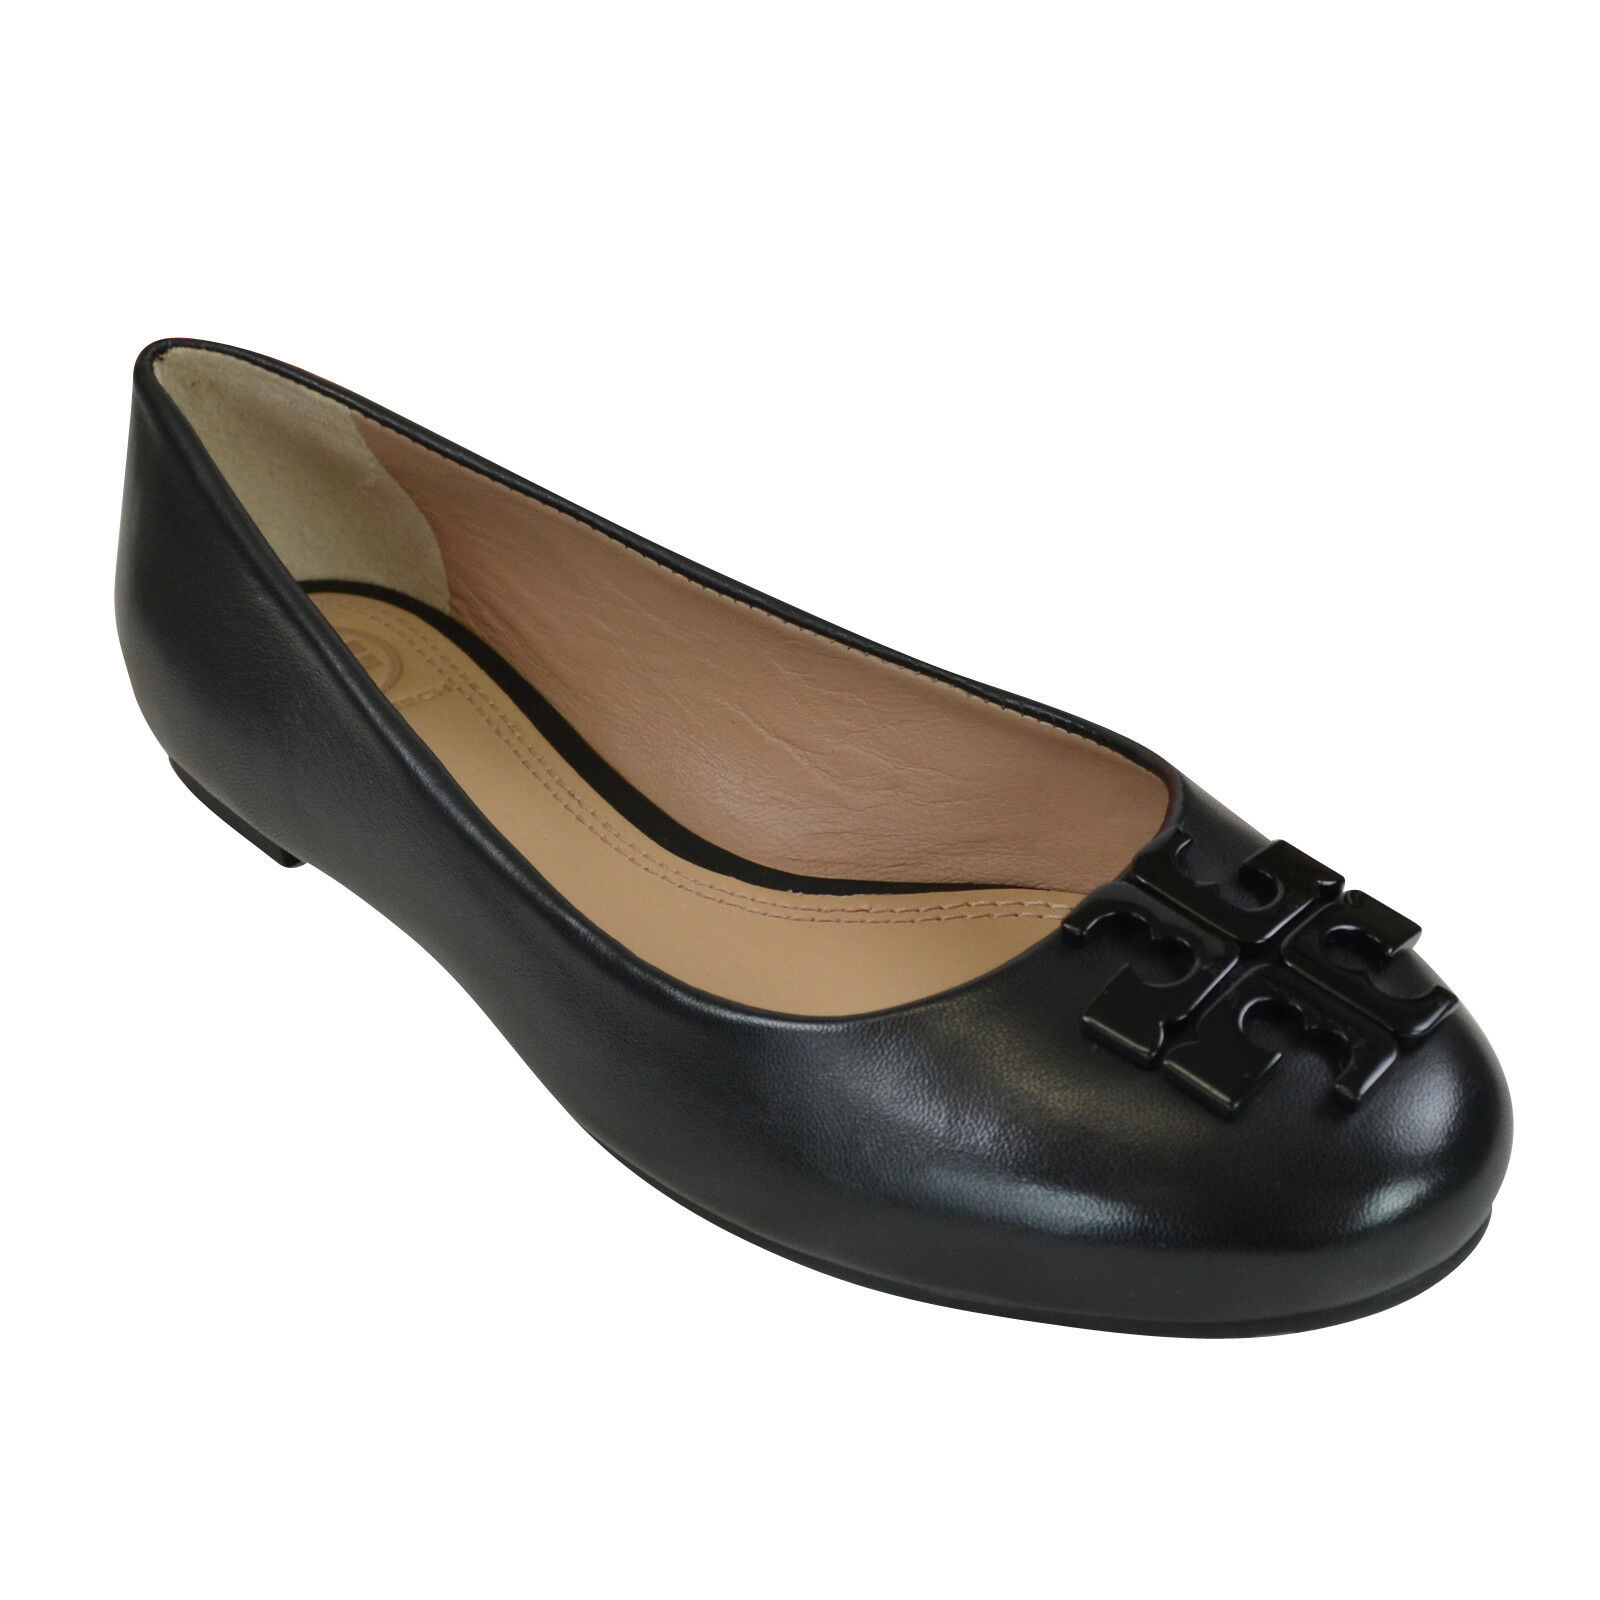 NIB Tory Burch LOWELL LOWELL Burch 2 Leather Ballet Flats in Black 6-9.5 996776